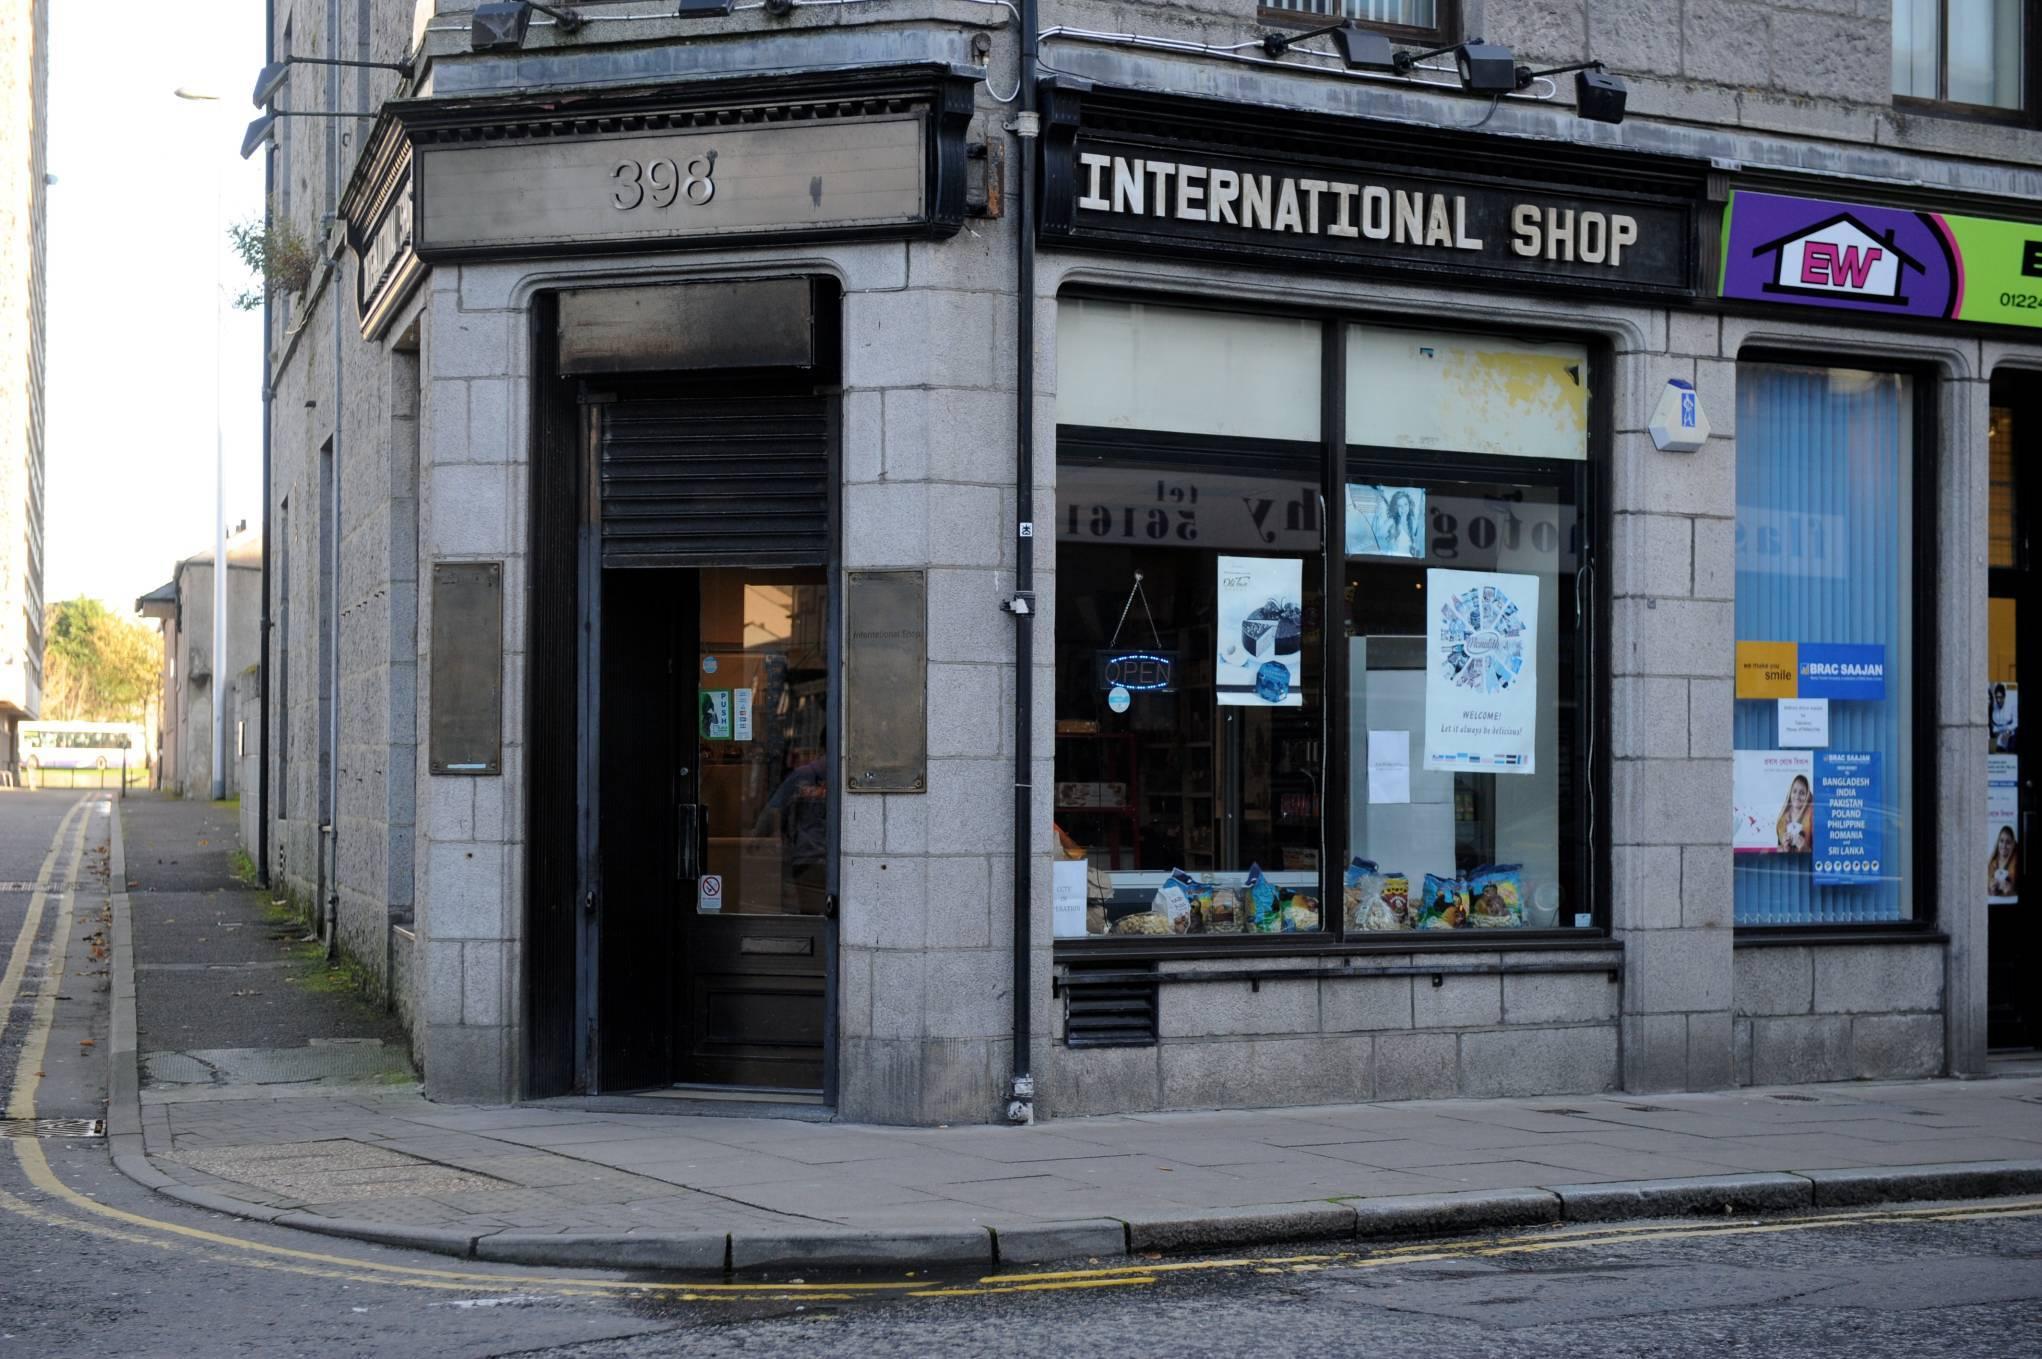 The International shop on George Street.